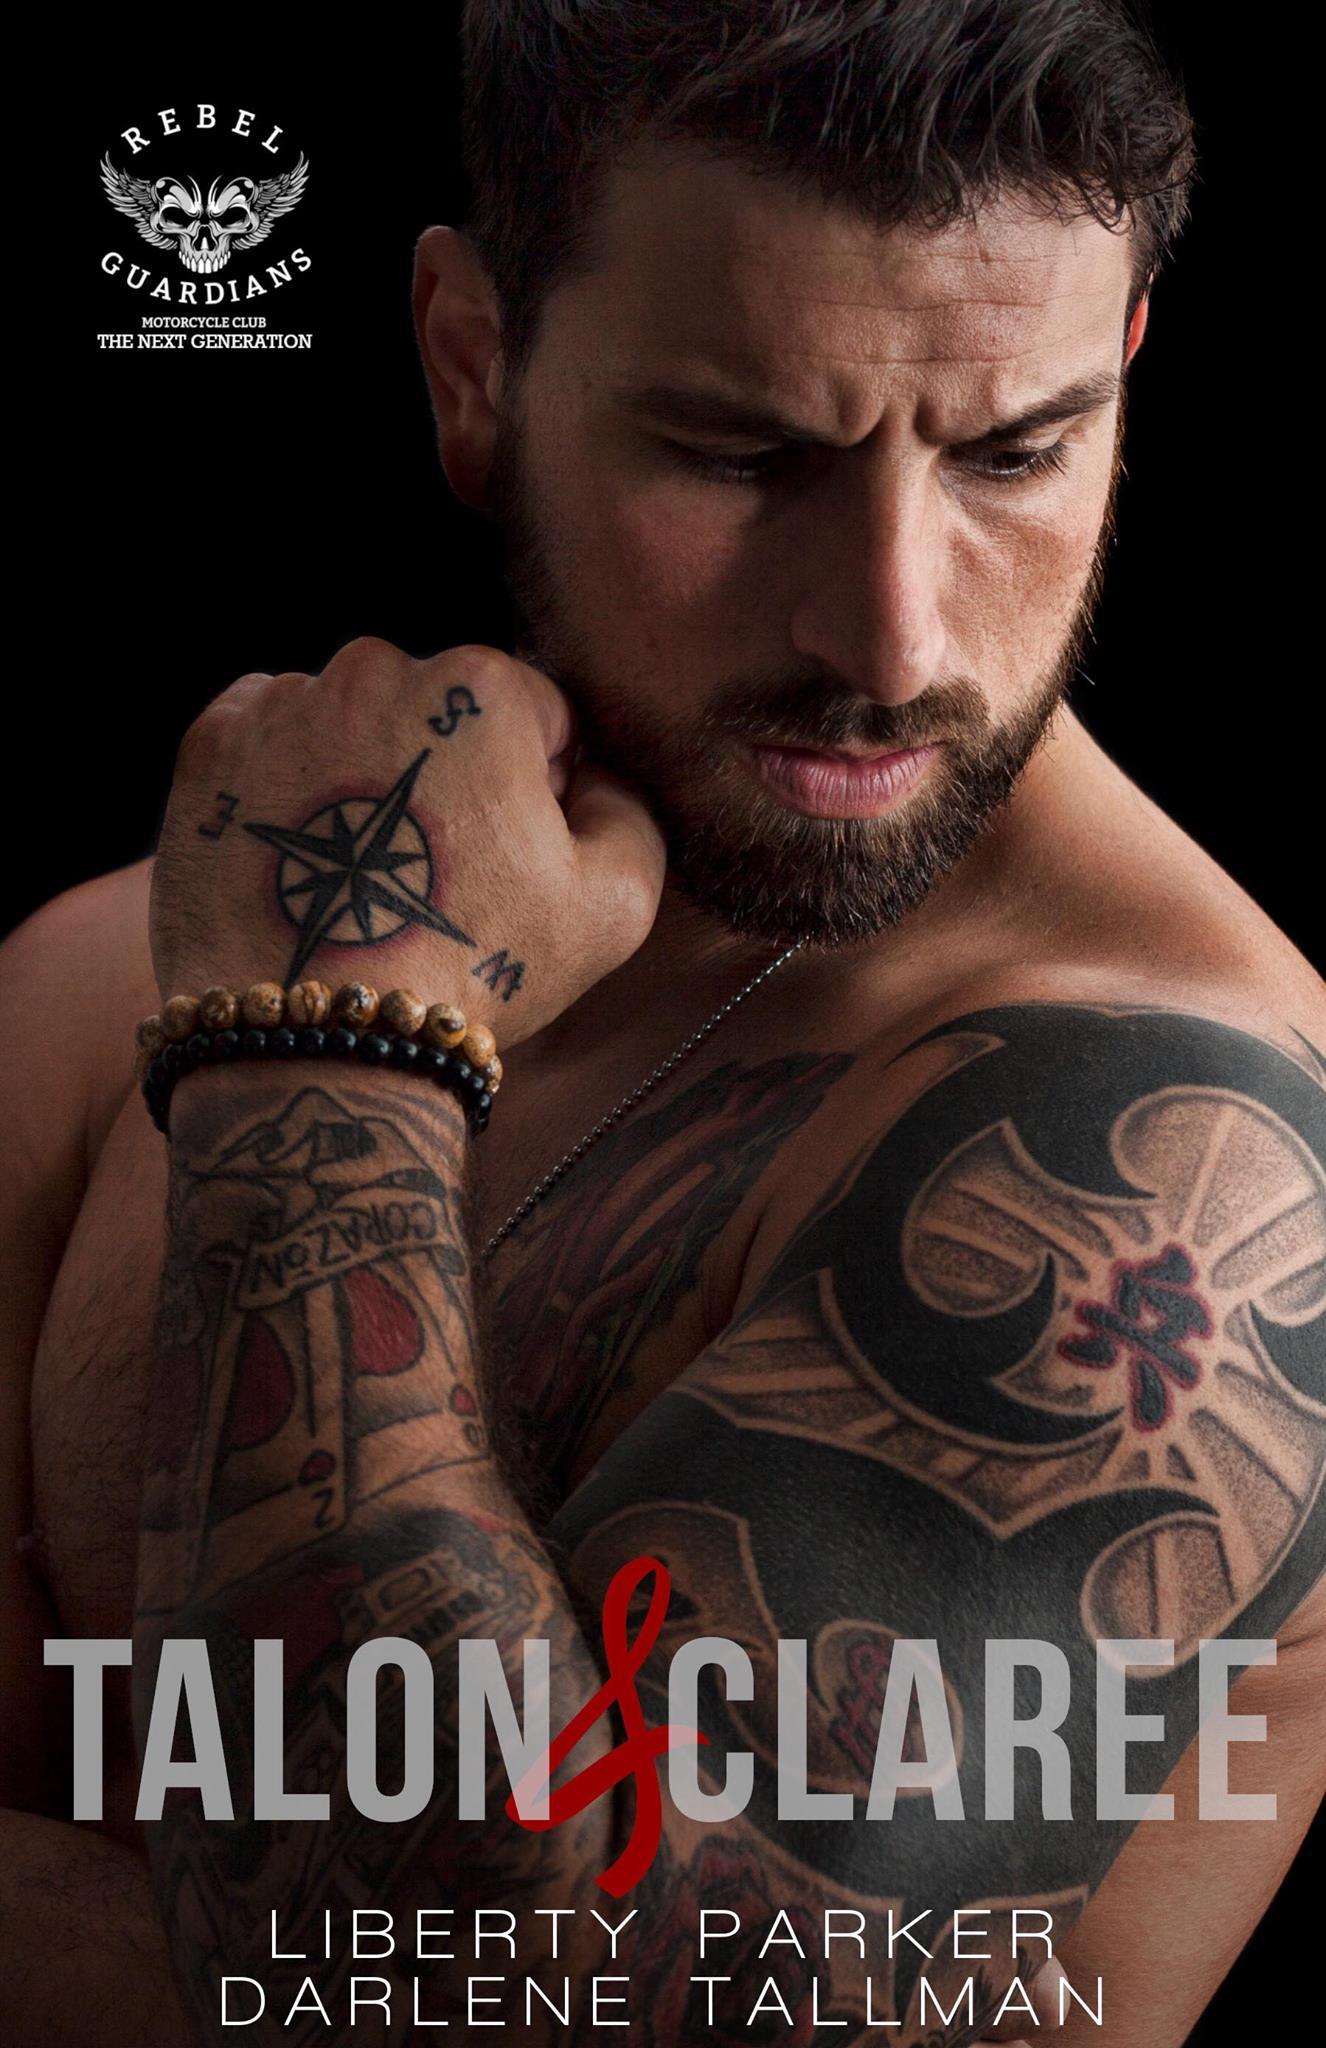 Talon & Claree (1).jpg